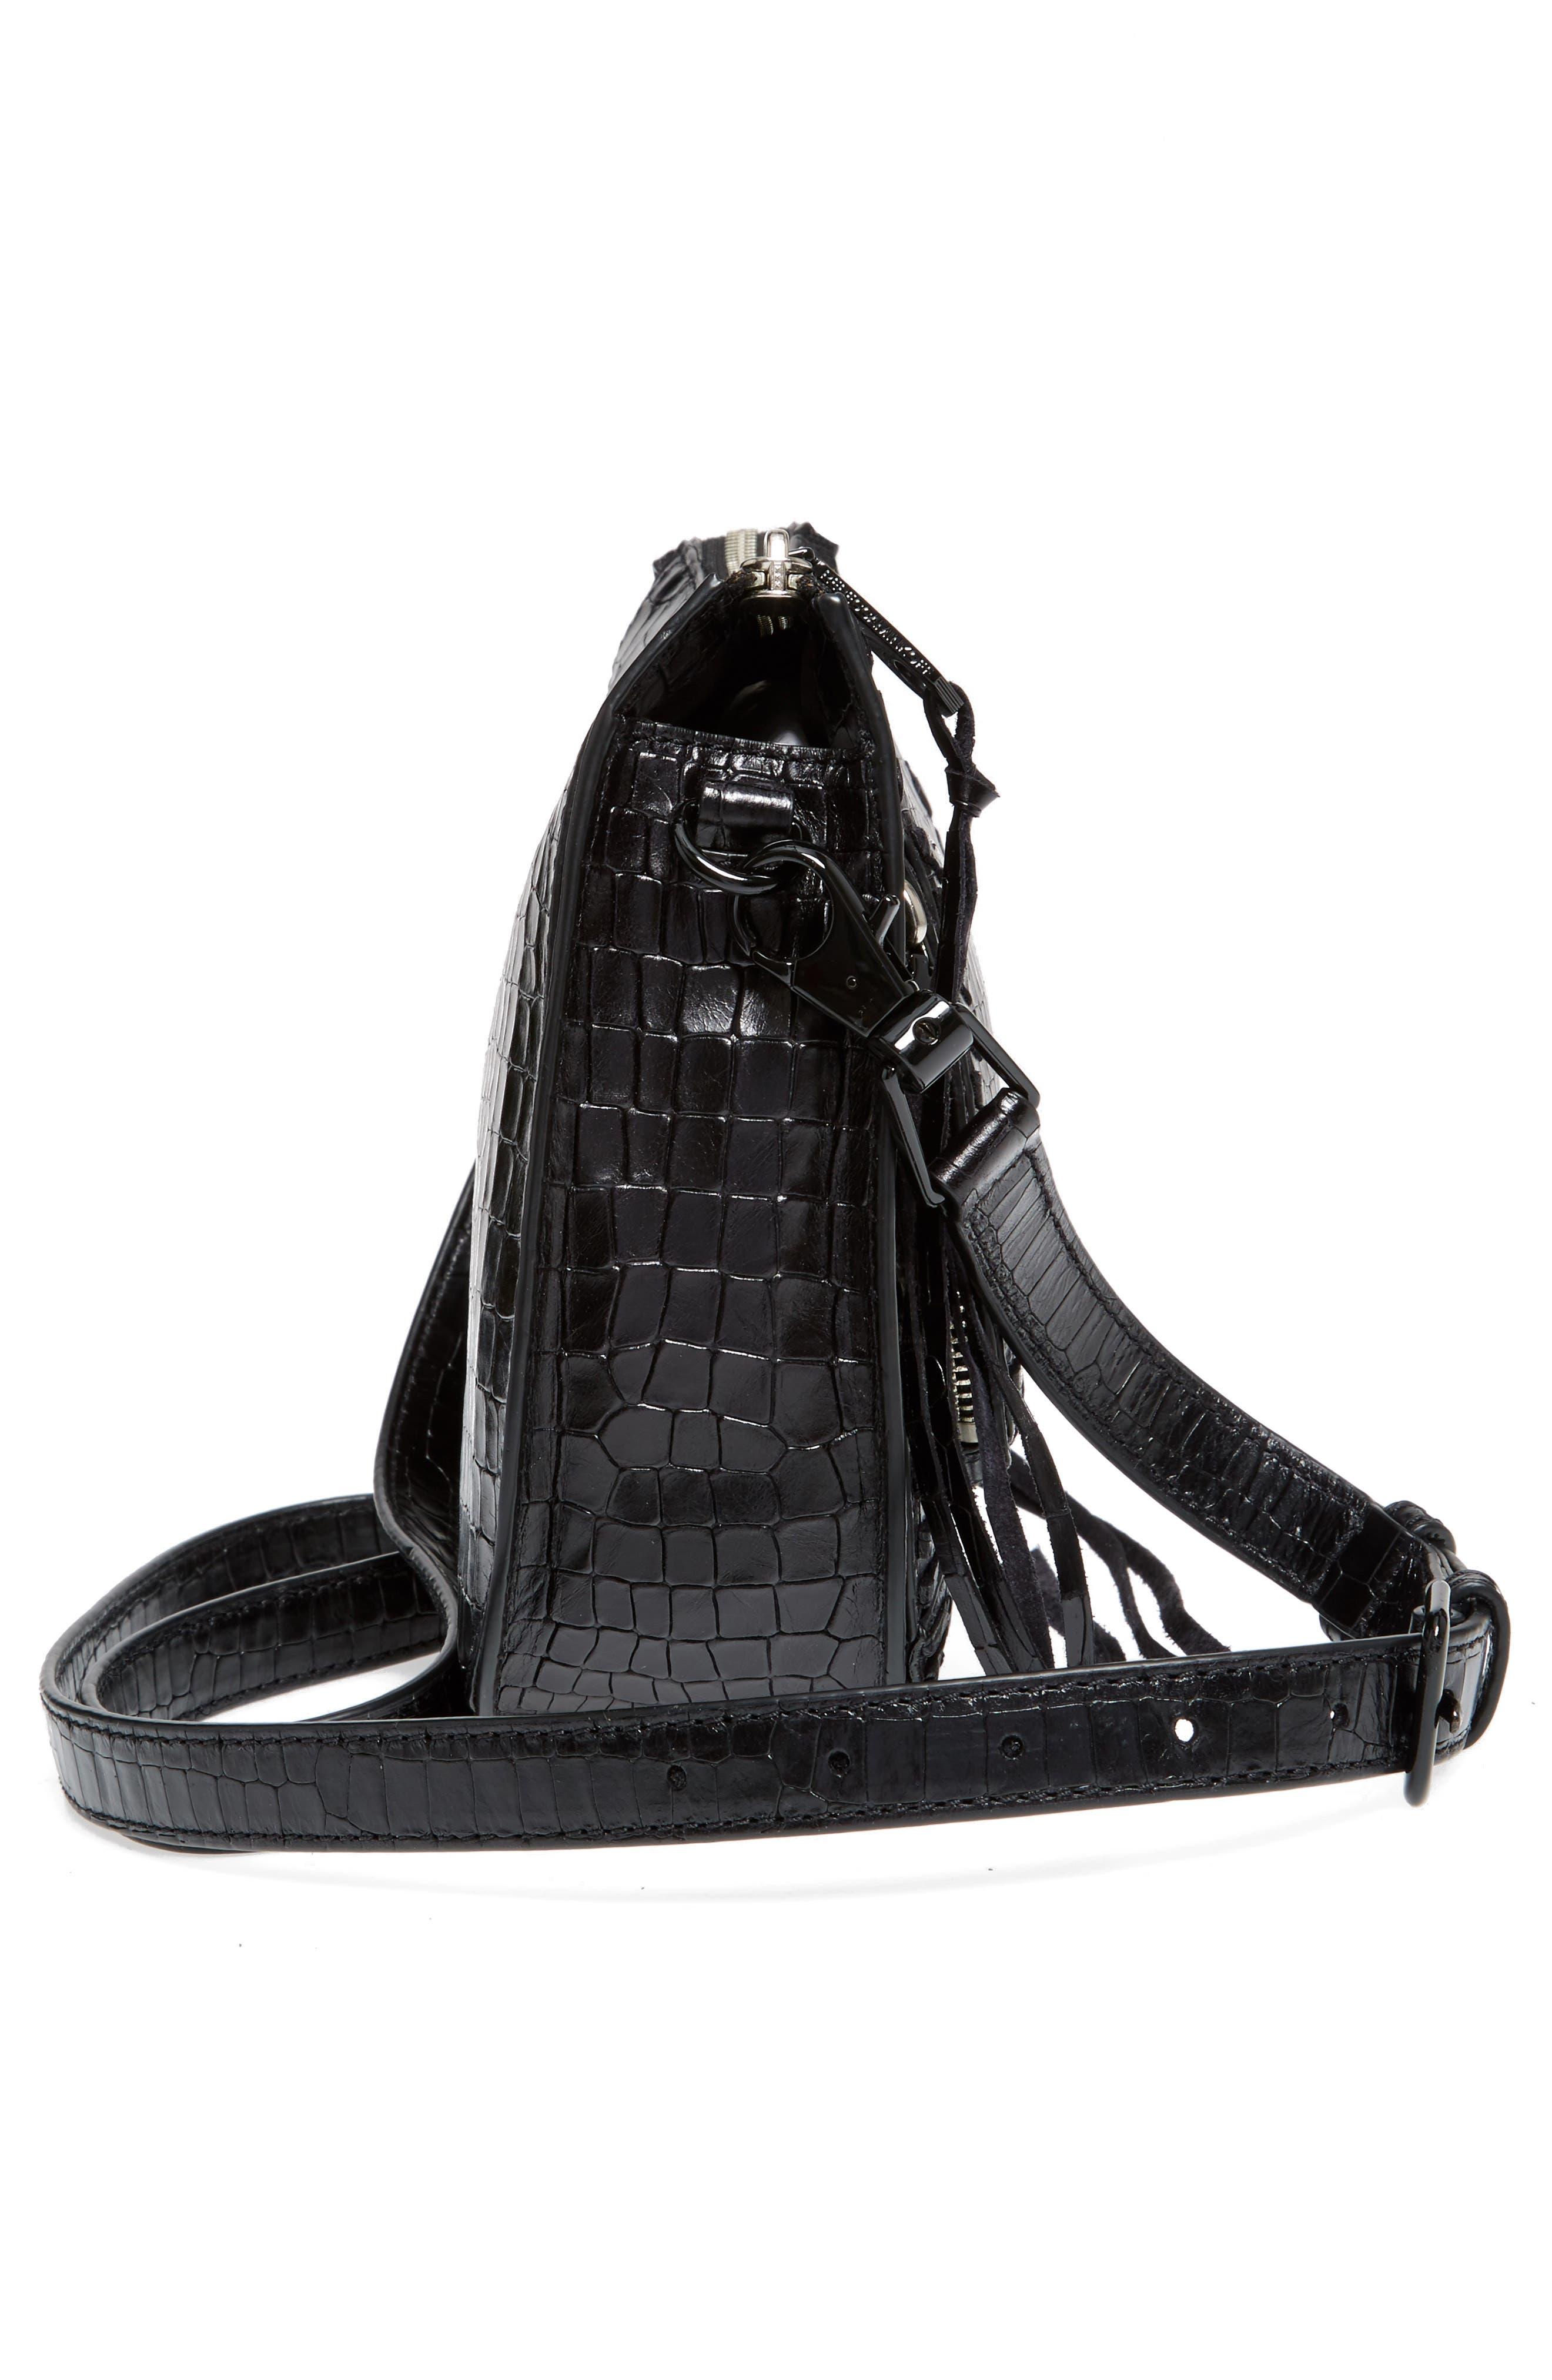 Vanity Croc-Embossed Leather Saddle Bag,                             Alternate thumbnail 5, color,